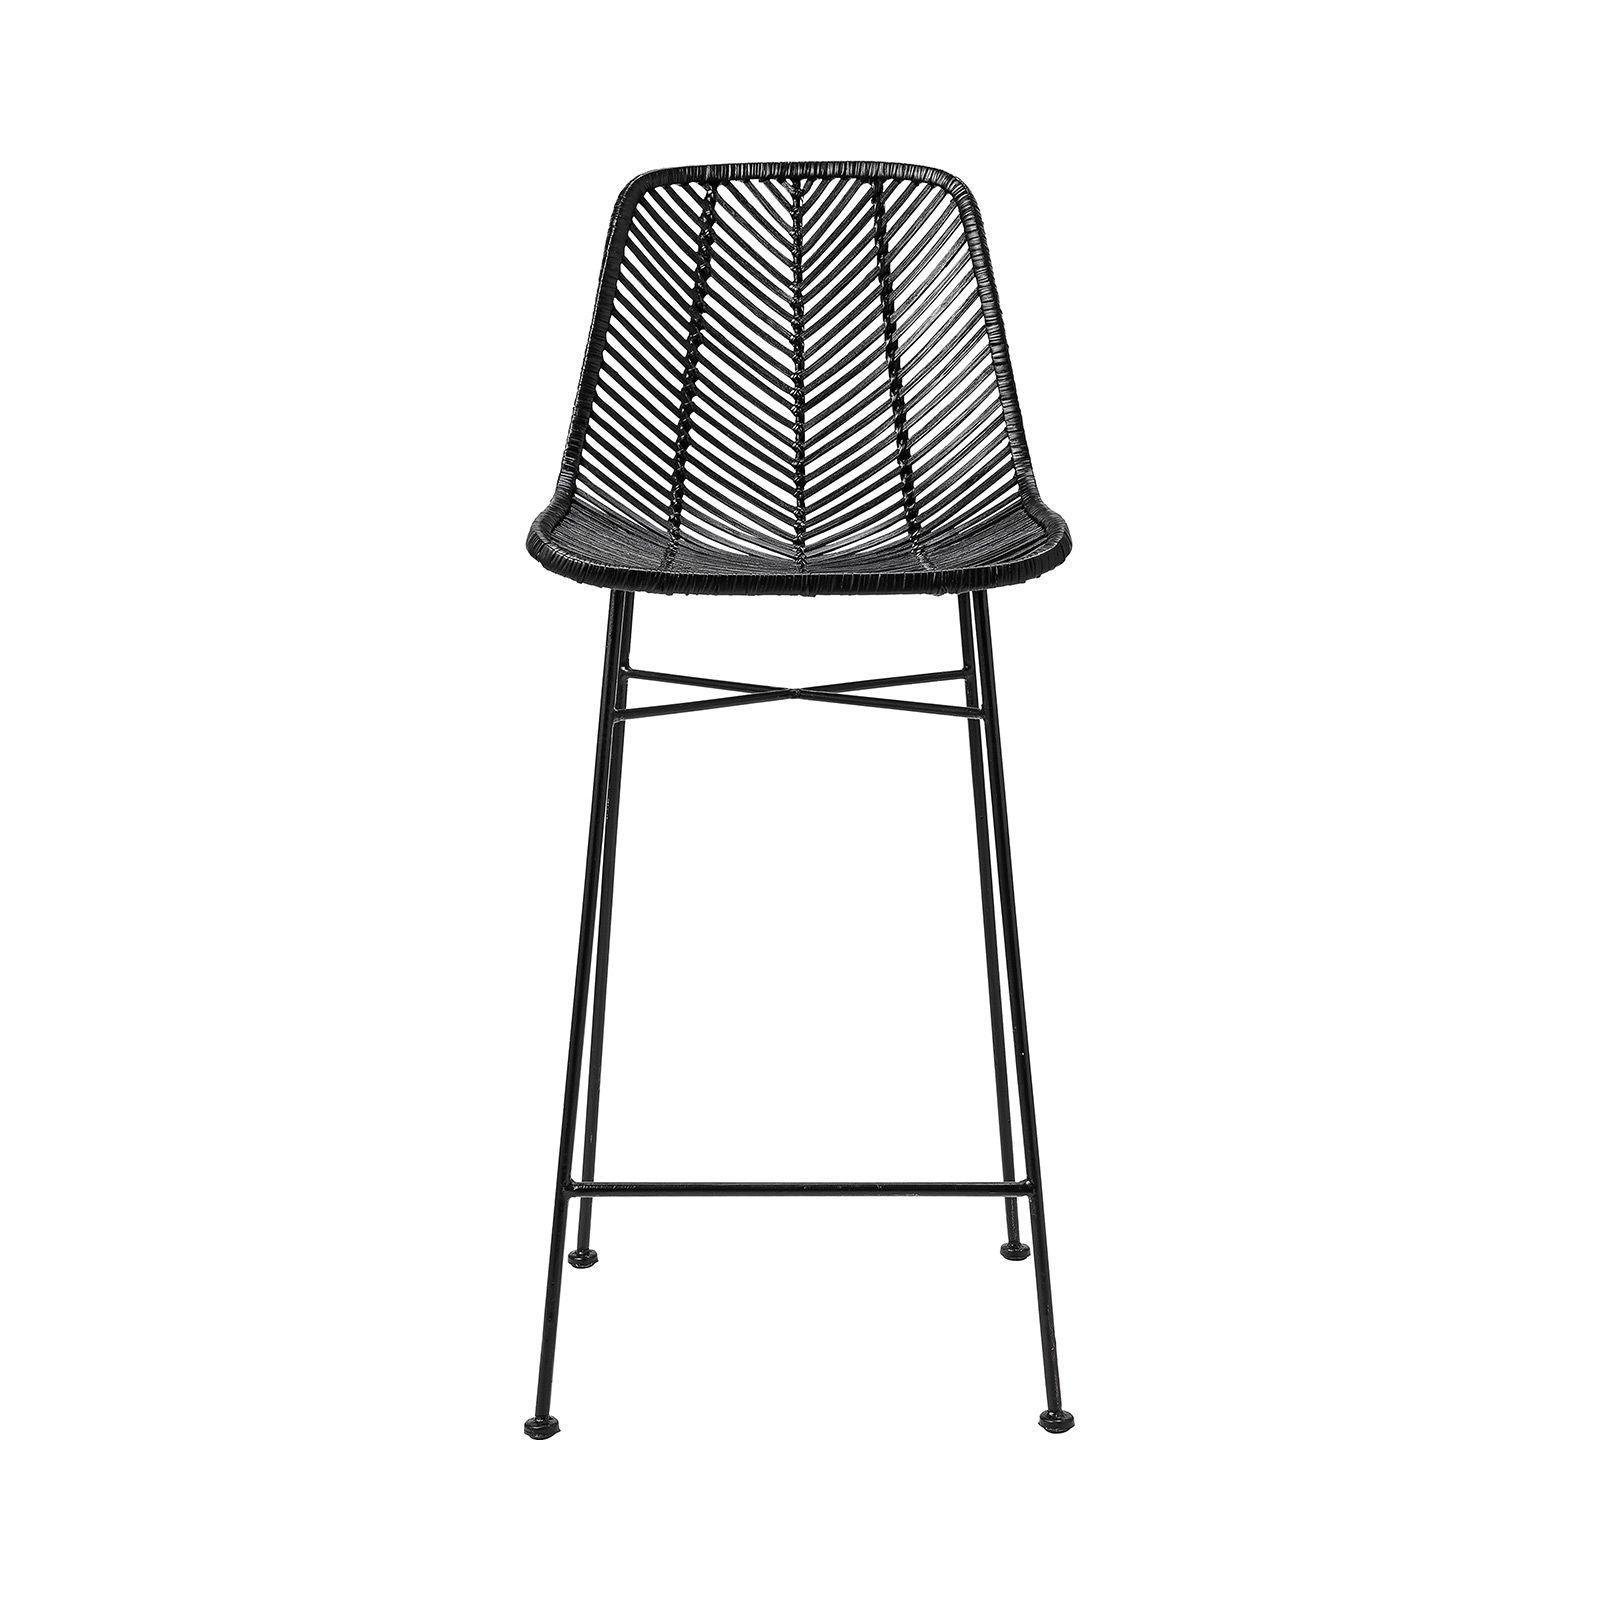 Broeder Rattan Bar Stool B B Pinterest 椅子、脚、家具